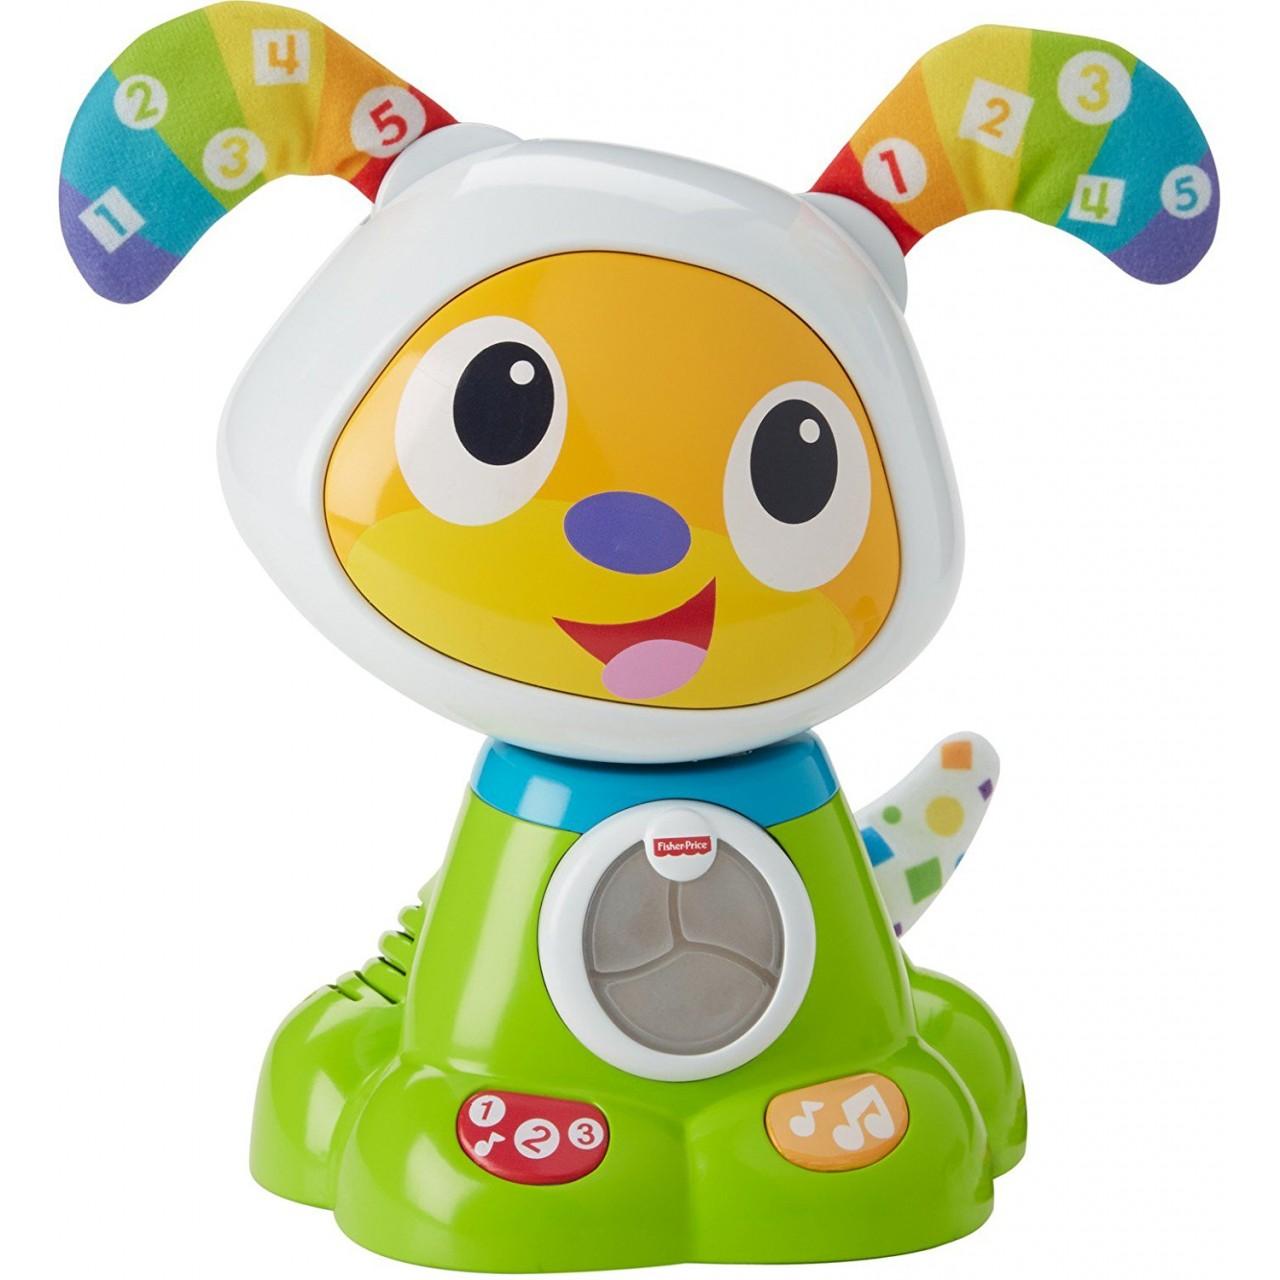 Интерактивная игрушка Танцующий щенок робот БиБо Fisher-Price